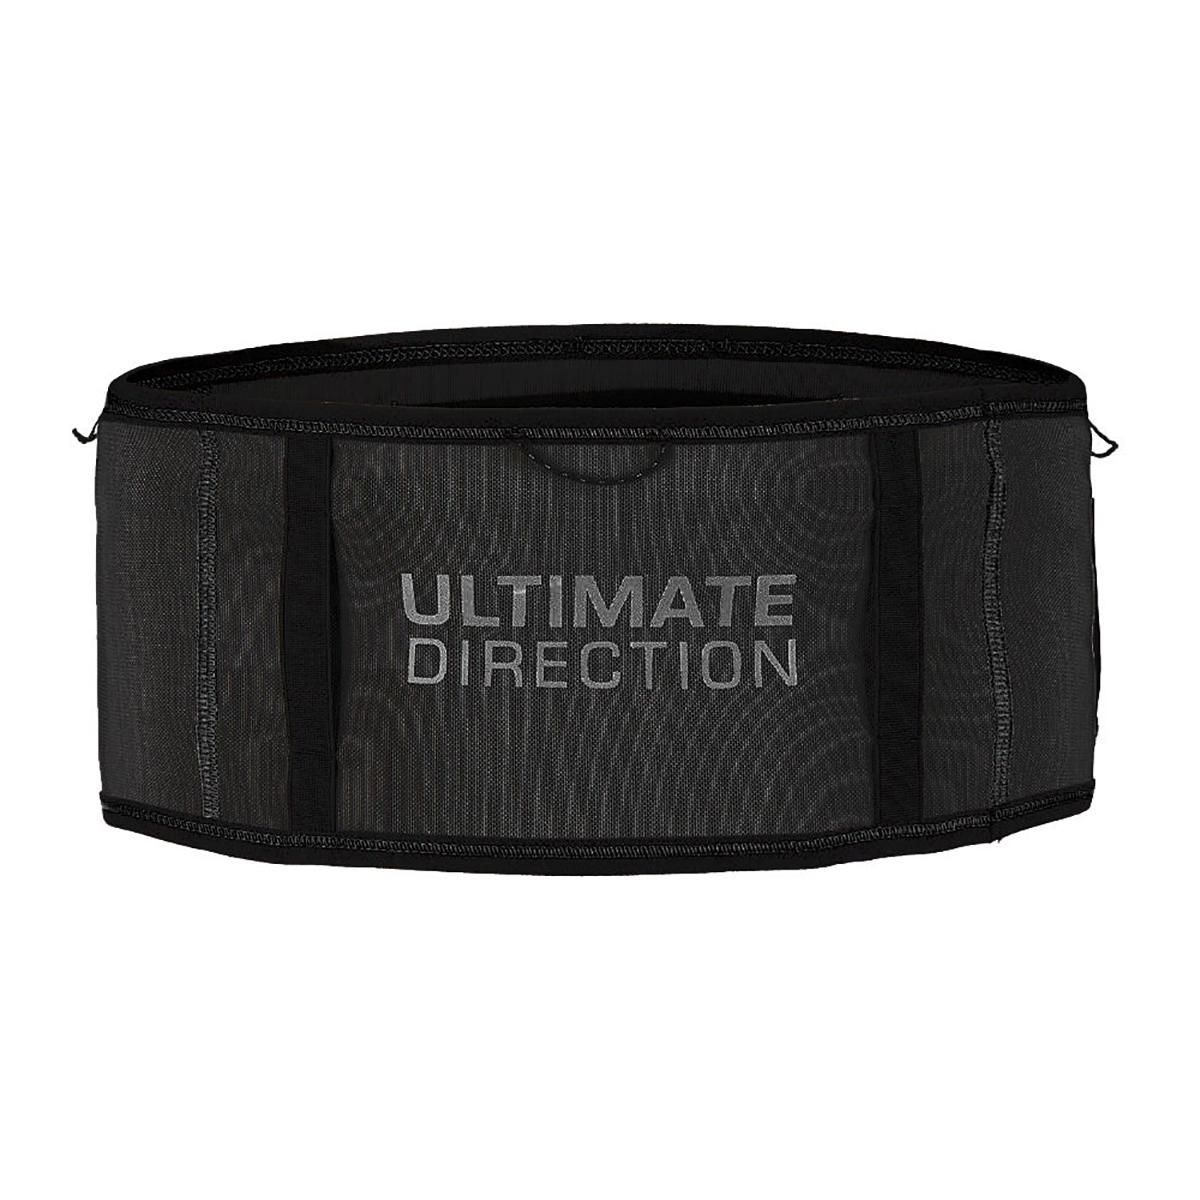 Ultimate Direct Utility Belt - Color: Onyx - Size: XS, Onyx, large, image 1